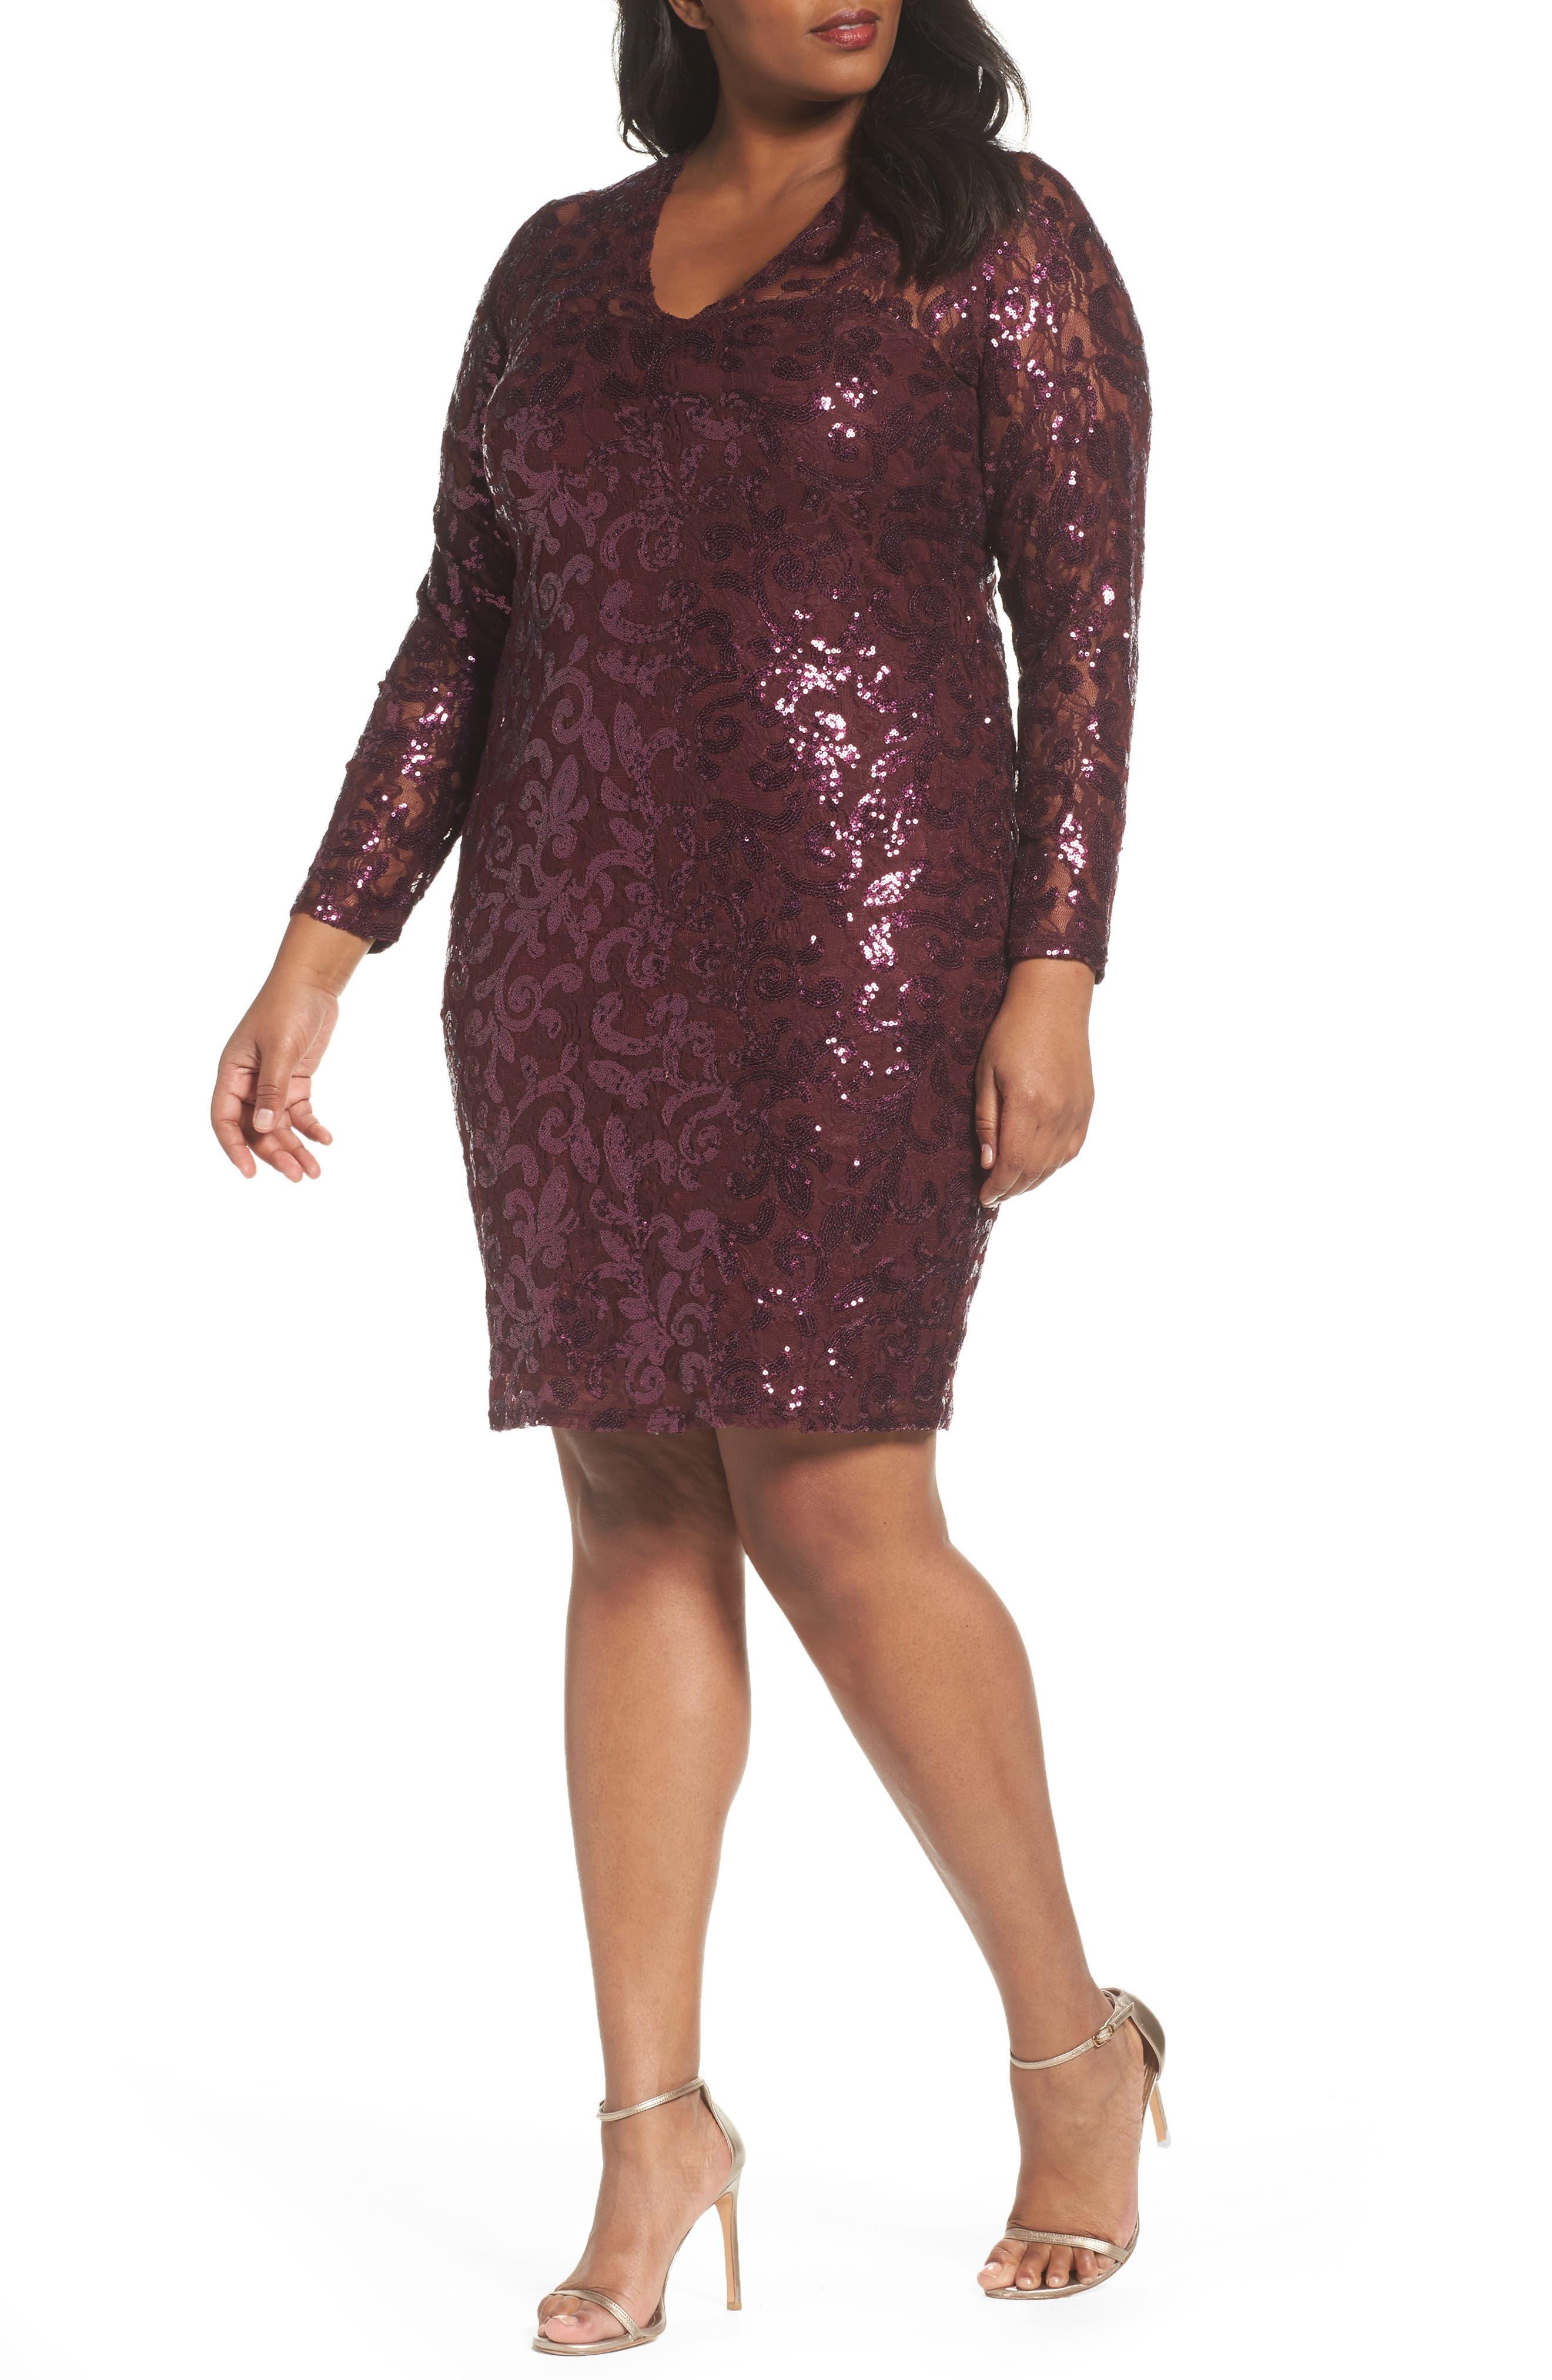 Alternate Image 1 Selected - Marina Sequin Lace Stretch Sheath Dress (Plus Size)